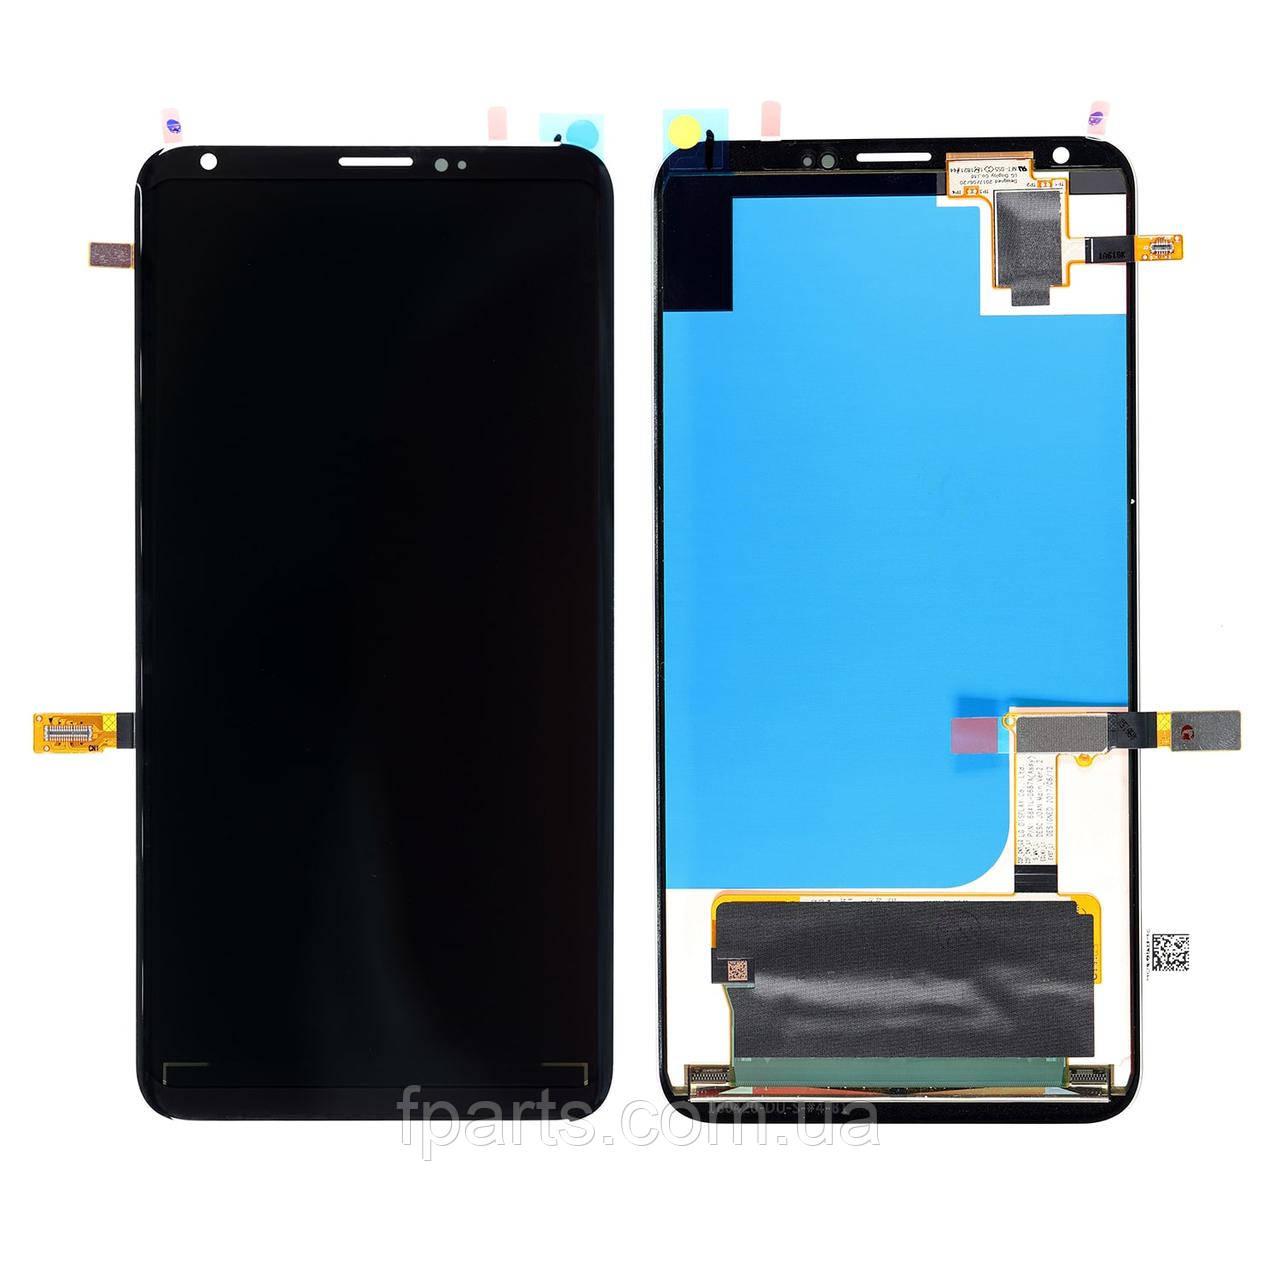 Дисплей для LG V30, V30+ (H930, H930DS, VS996, LS998U, US998) с тачскрином, Black (Original PRC)